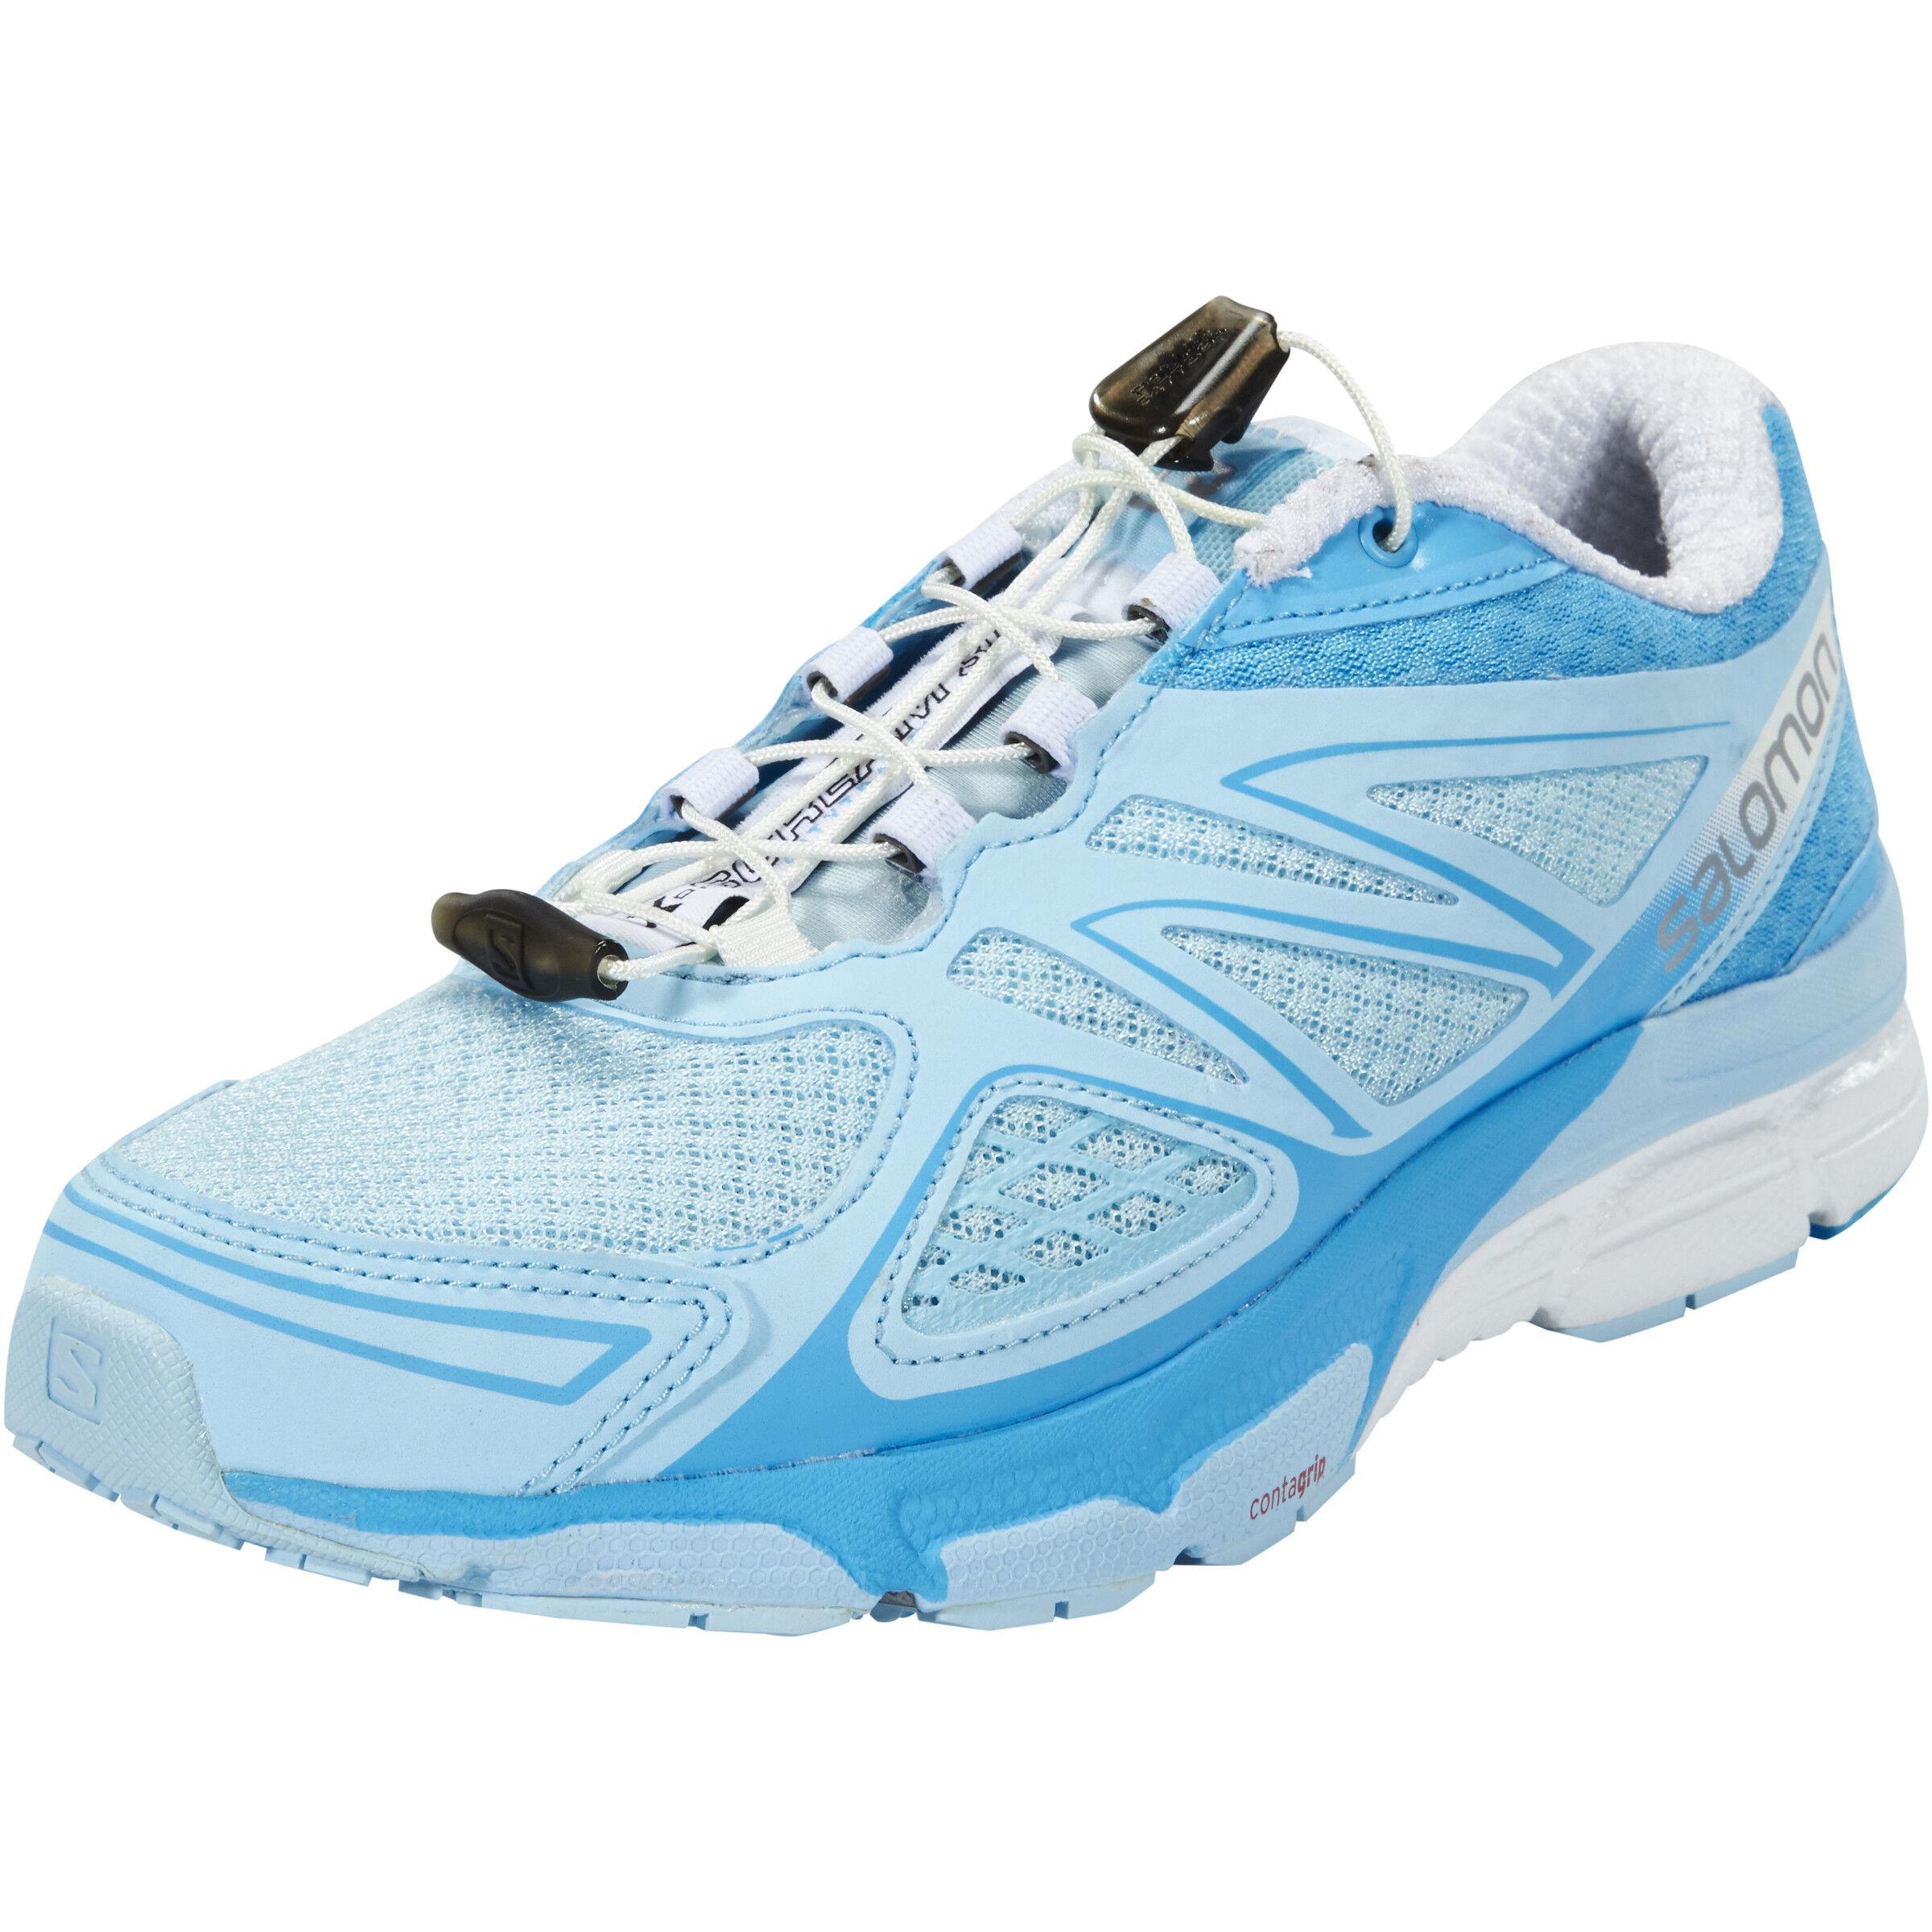 Salomon X Scream 3D Trailrunning Shoes Damen airwhiteblue line